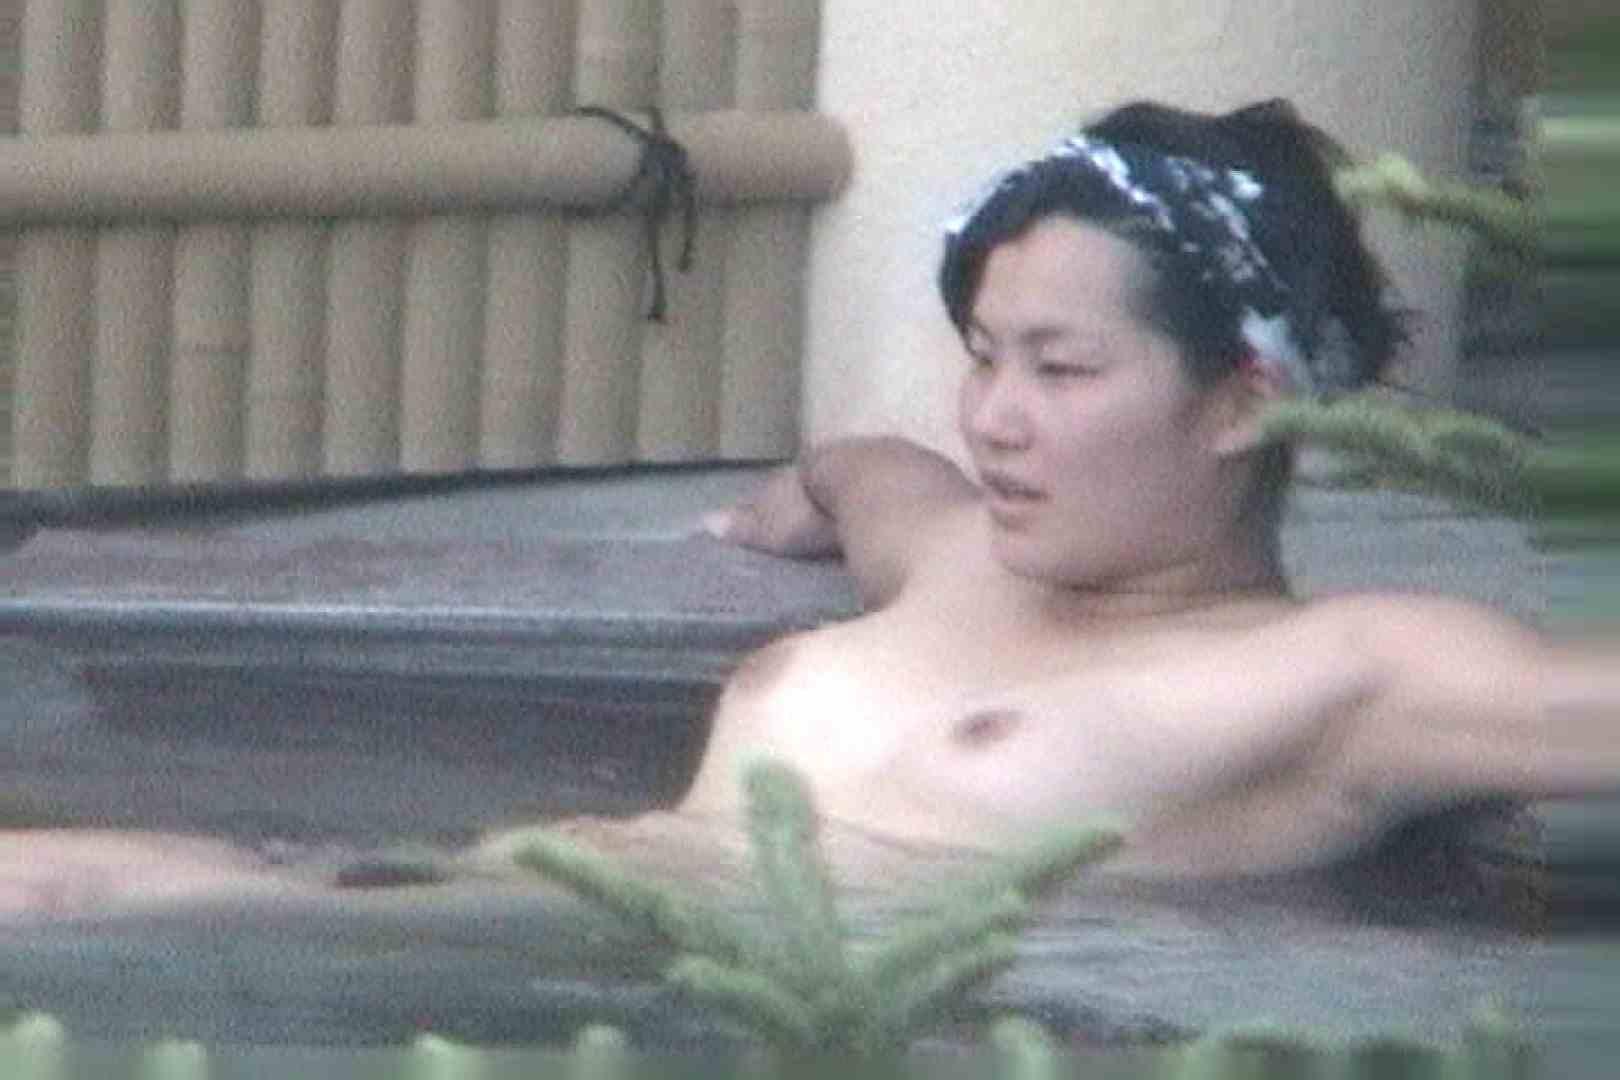 Aquaな露天風呂Vol.103 OLセックス 隠し撮りAV無料 57画像 53